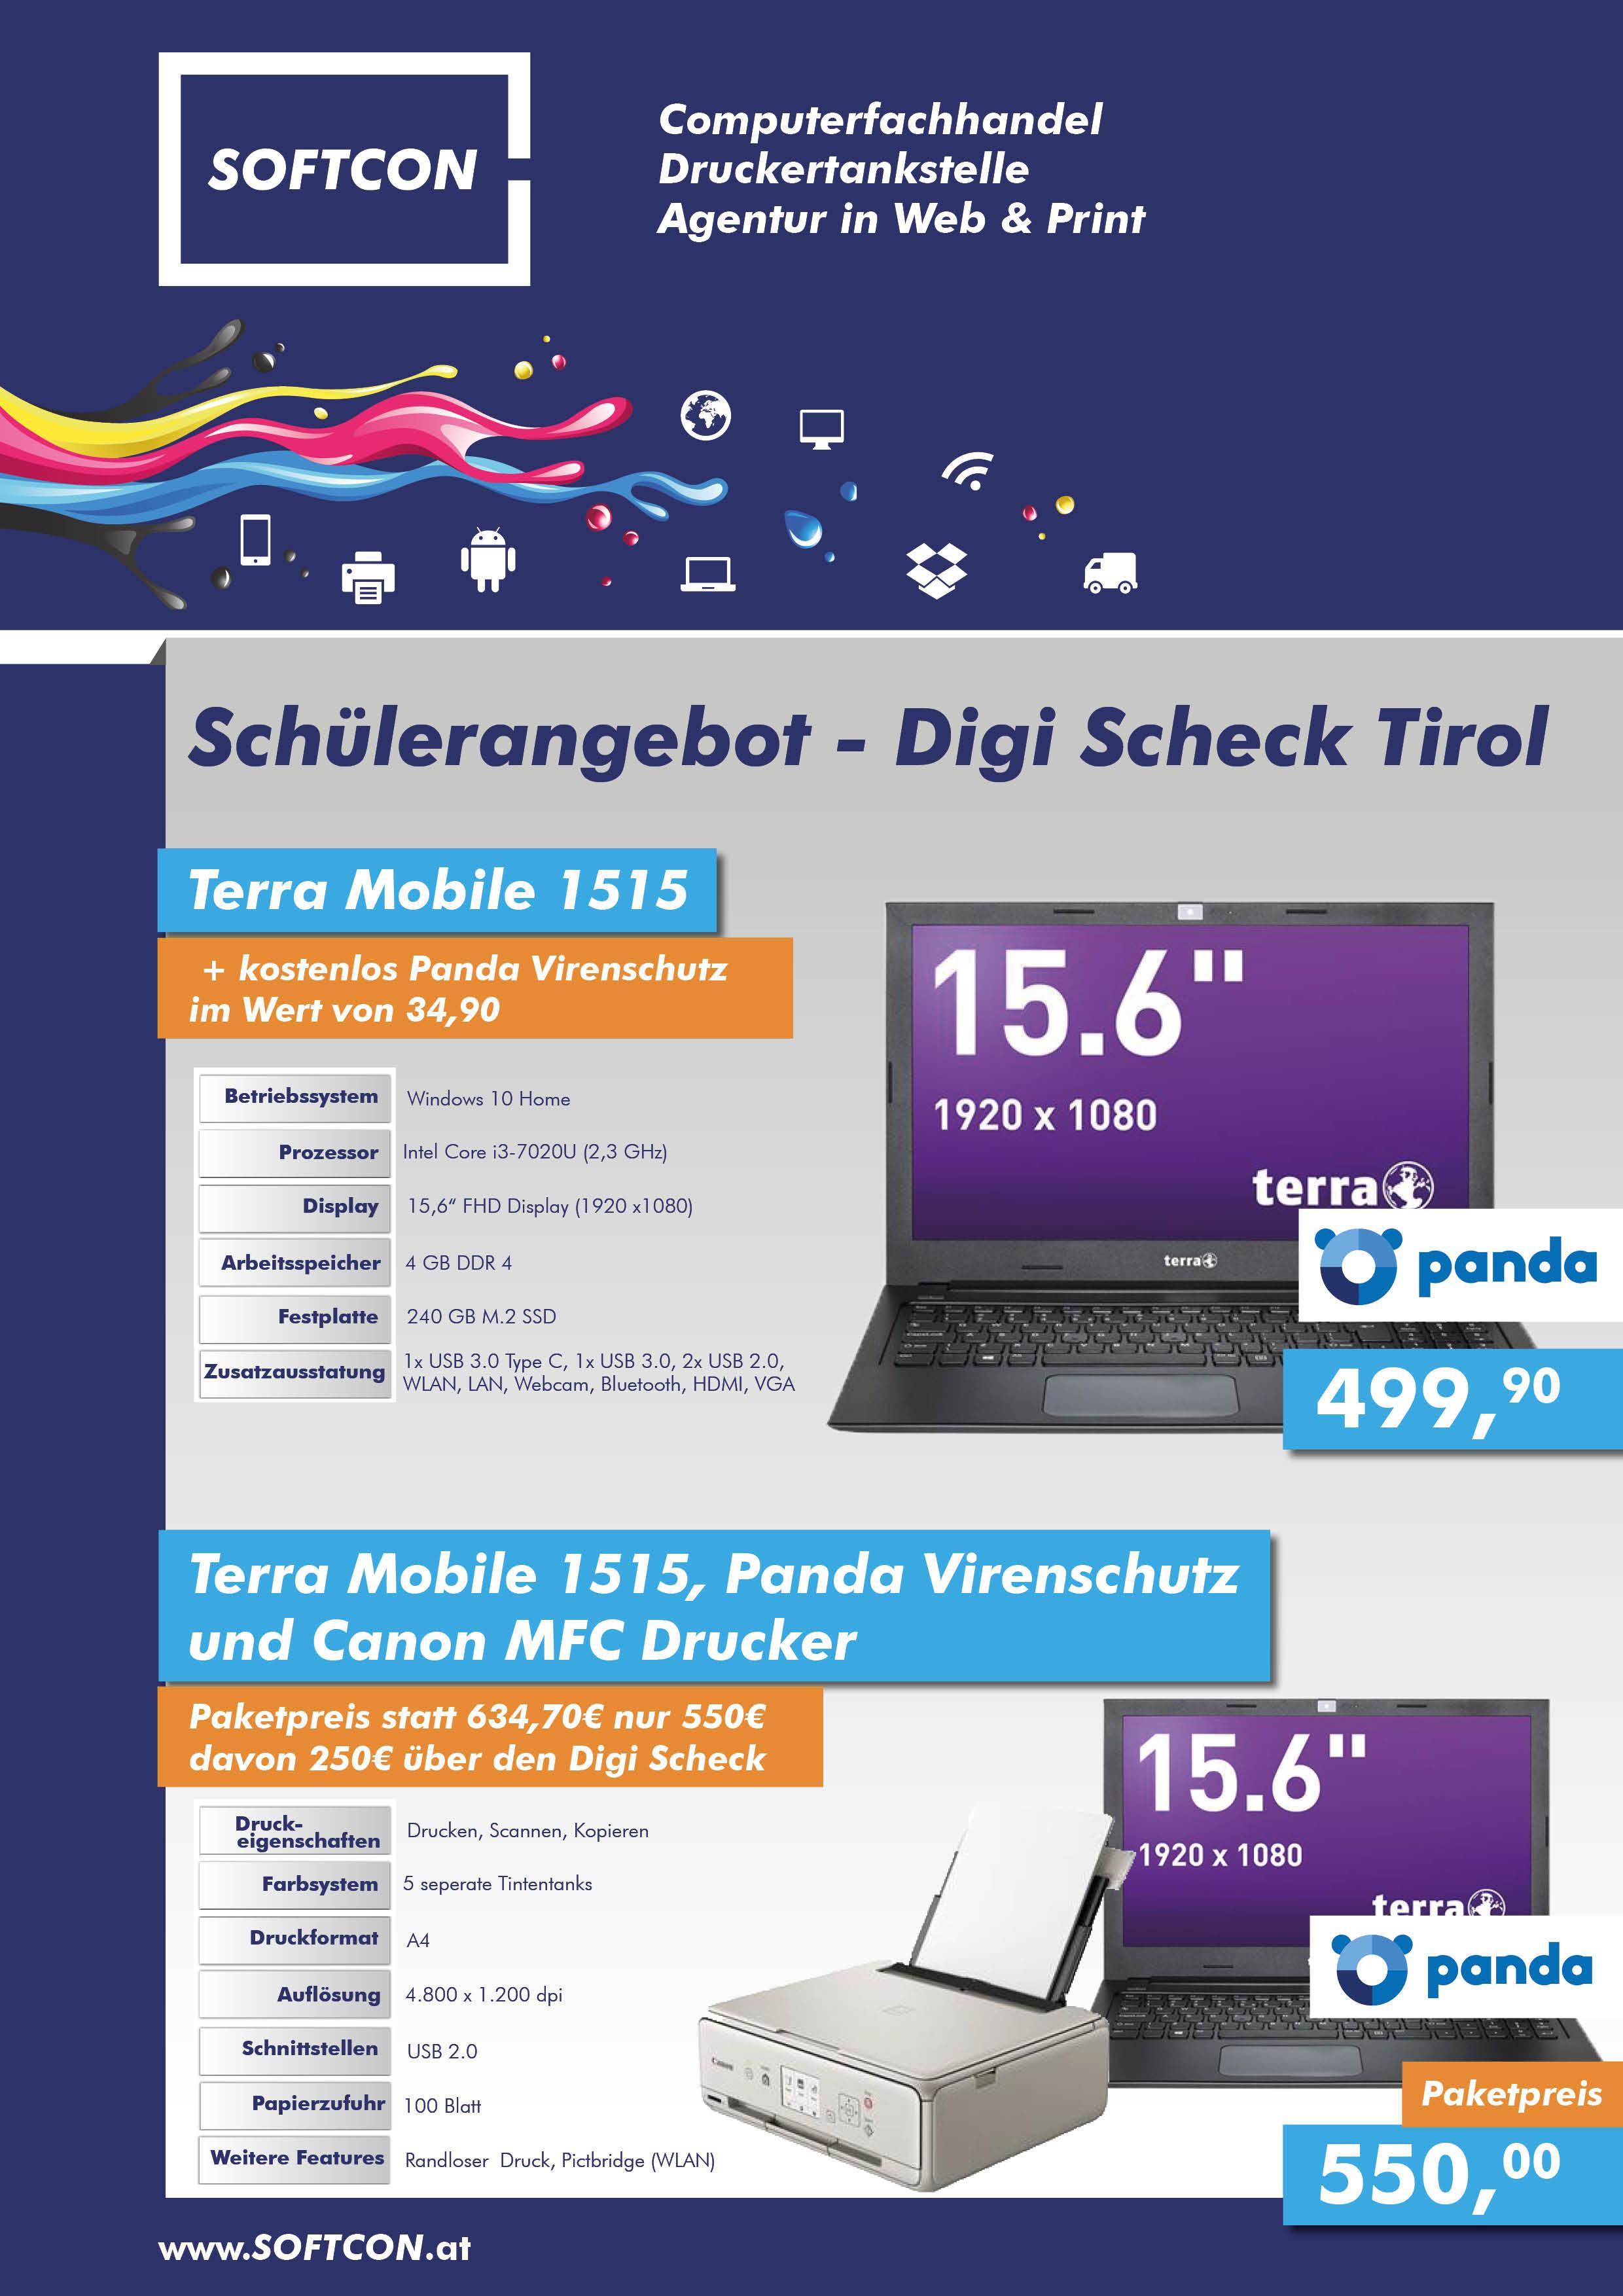 SOFTCON Schülerangebot – Digi Scheck Tirol